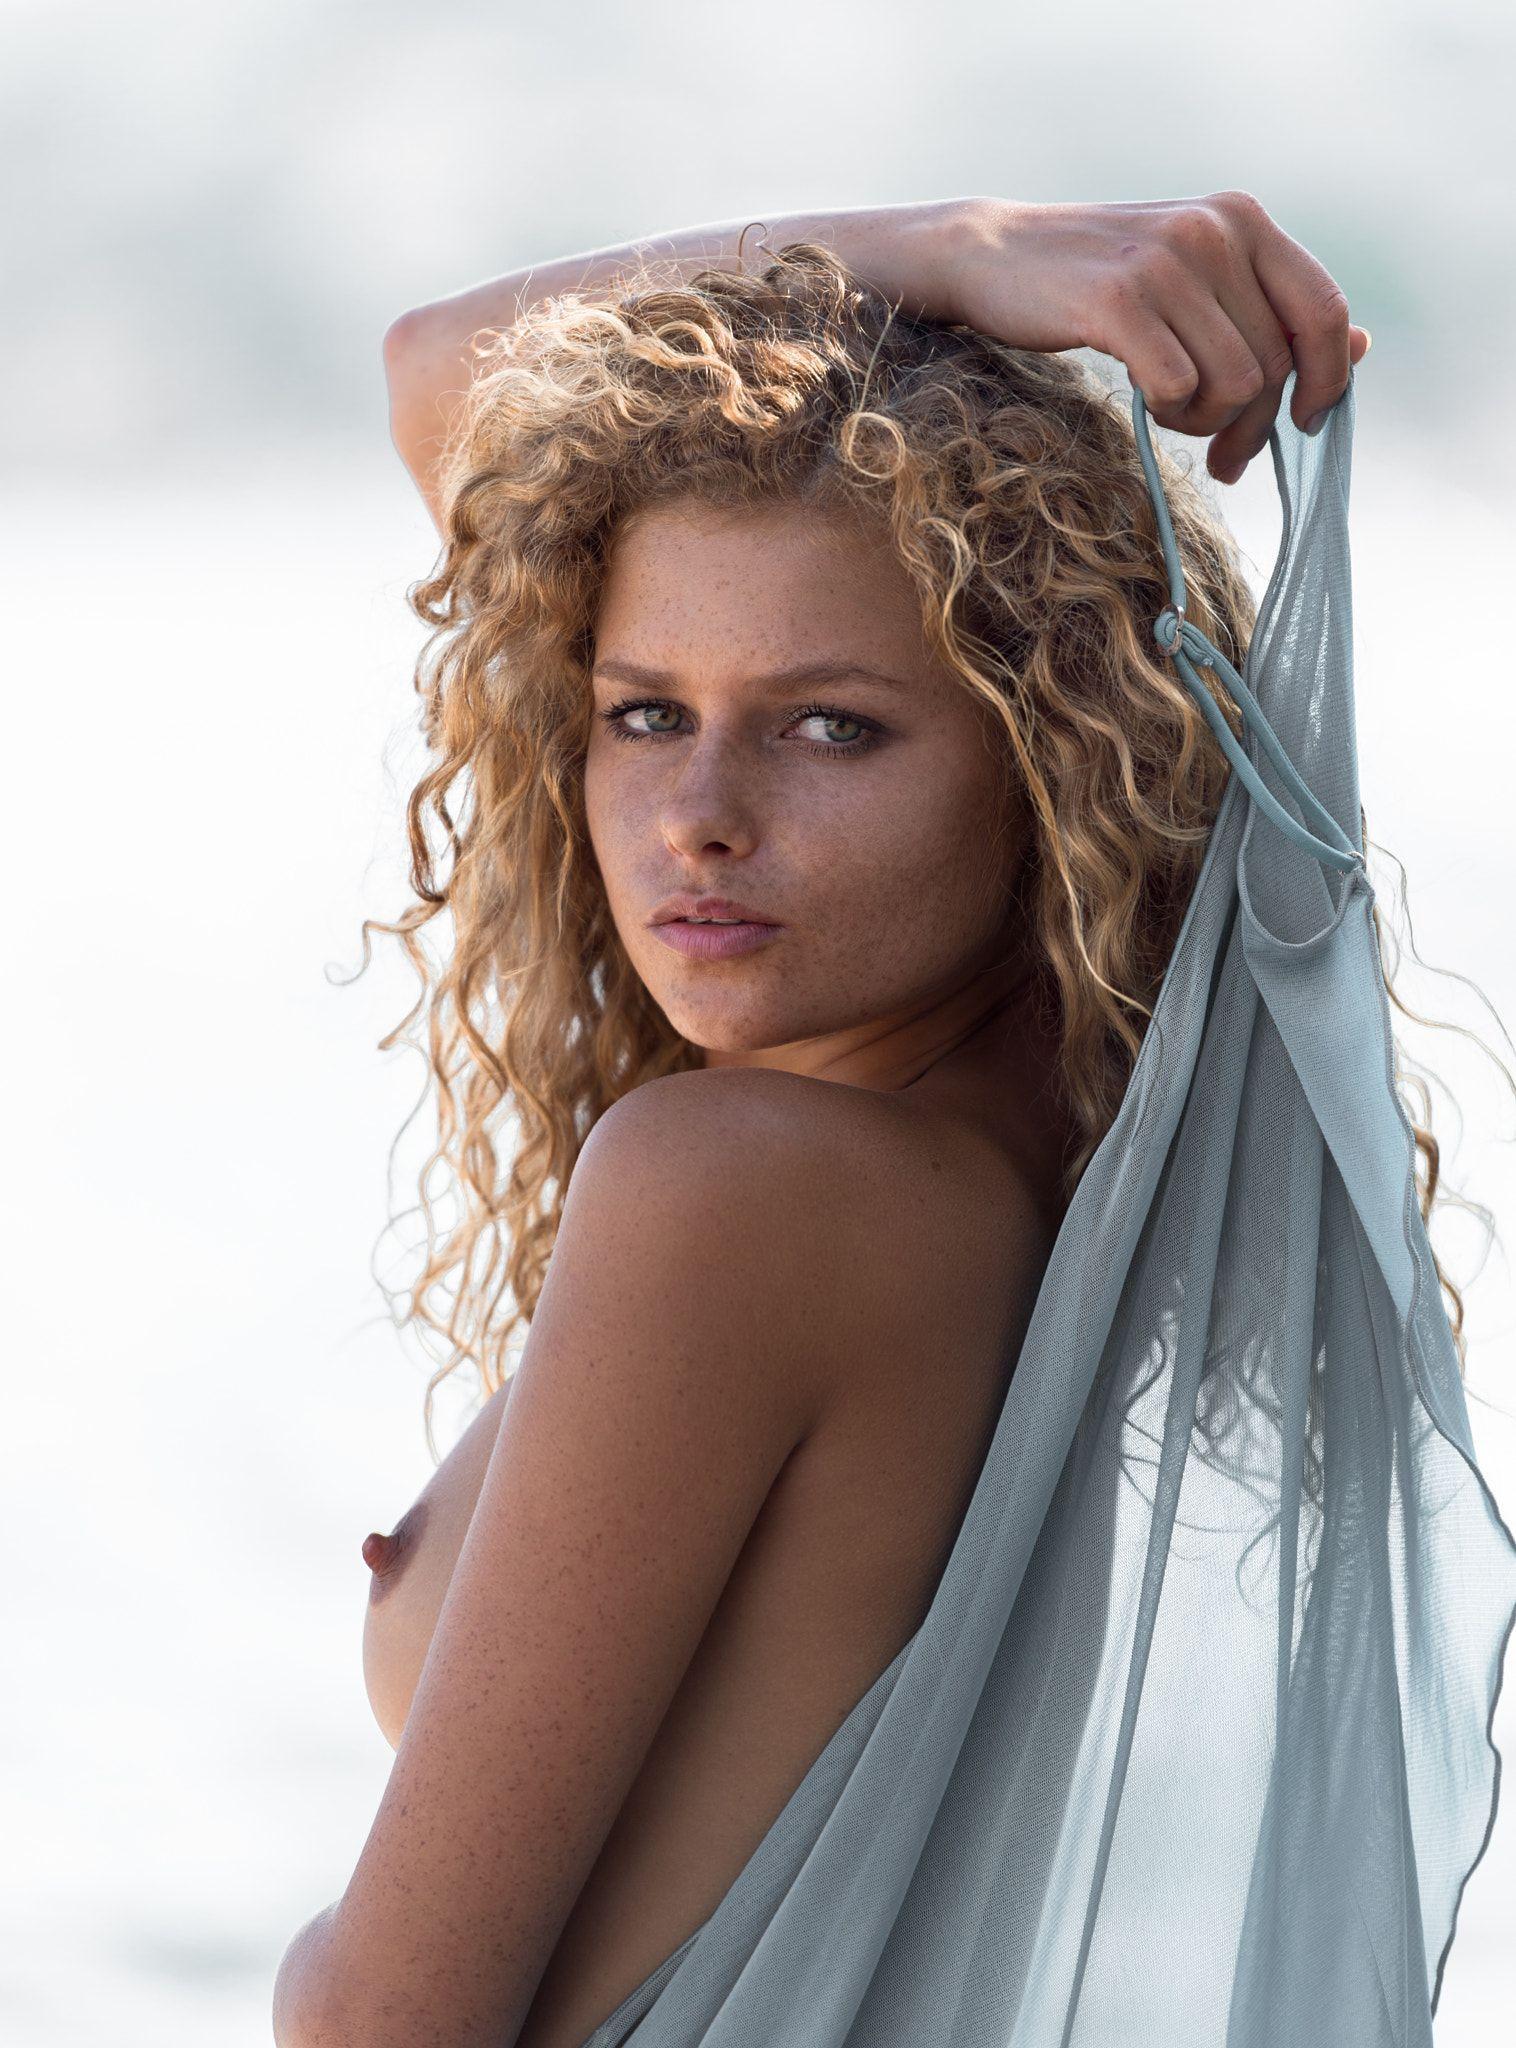 Julia Yaroshenko Nude Photos 63